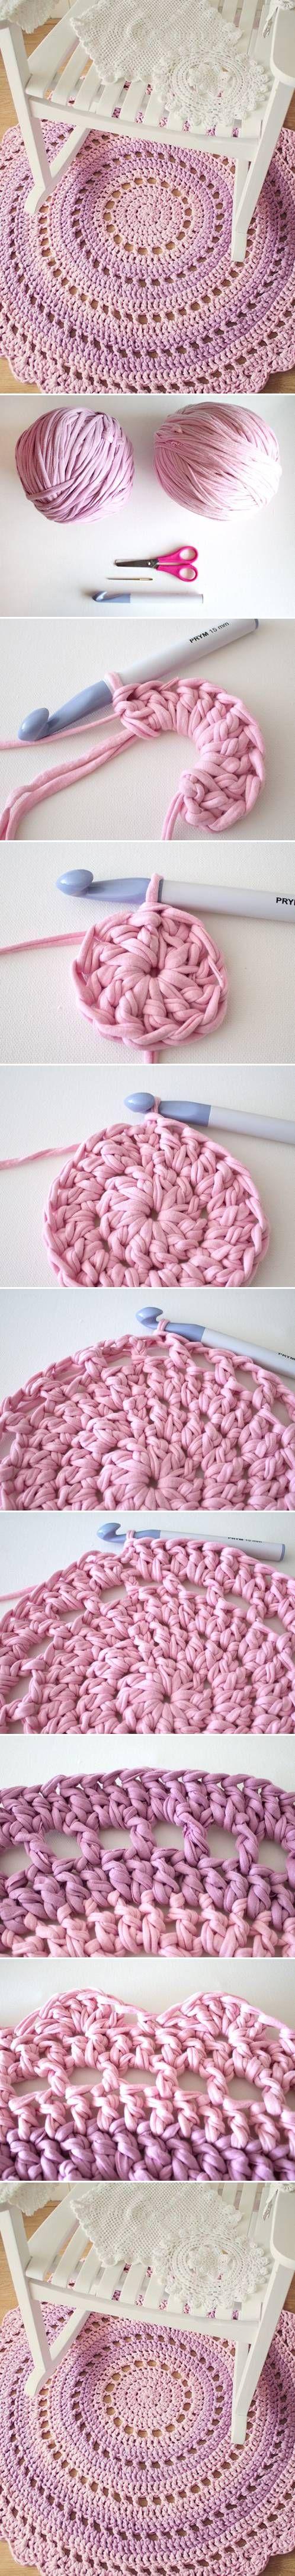 Crochet Mandala Rug Tutorial!